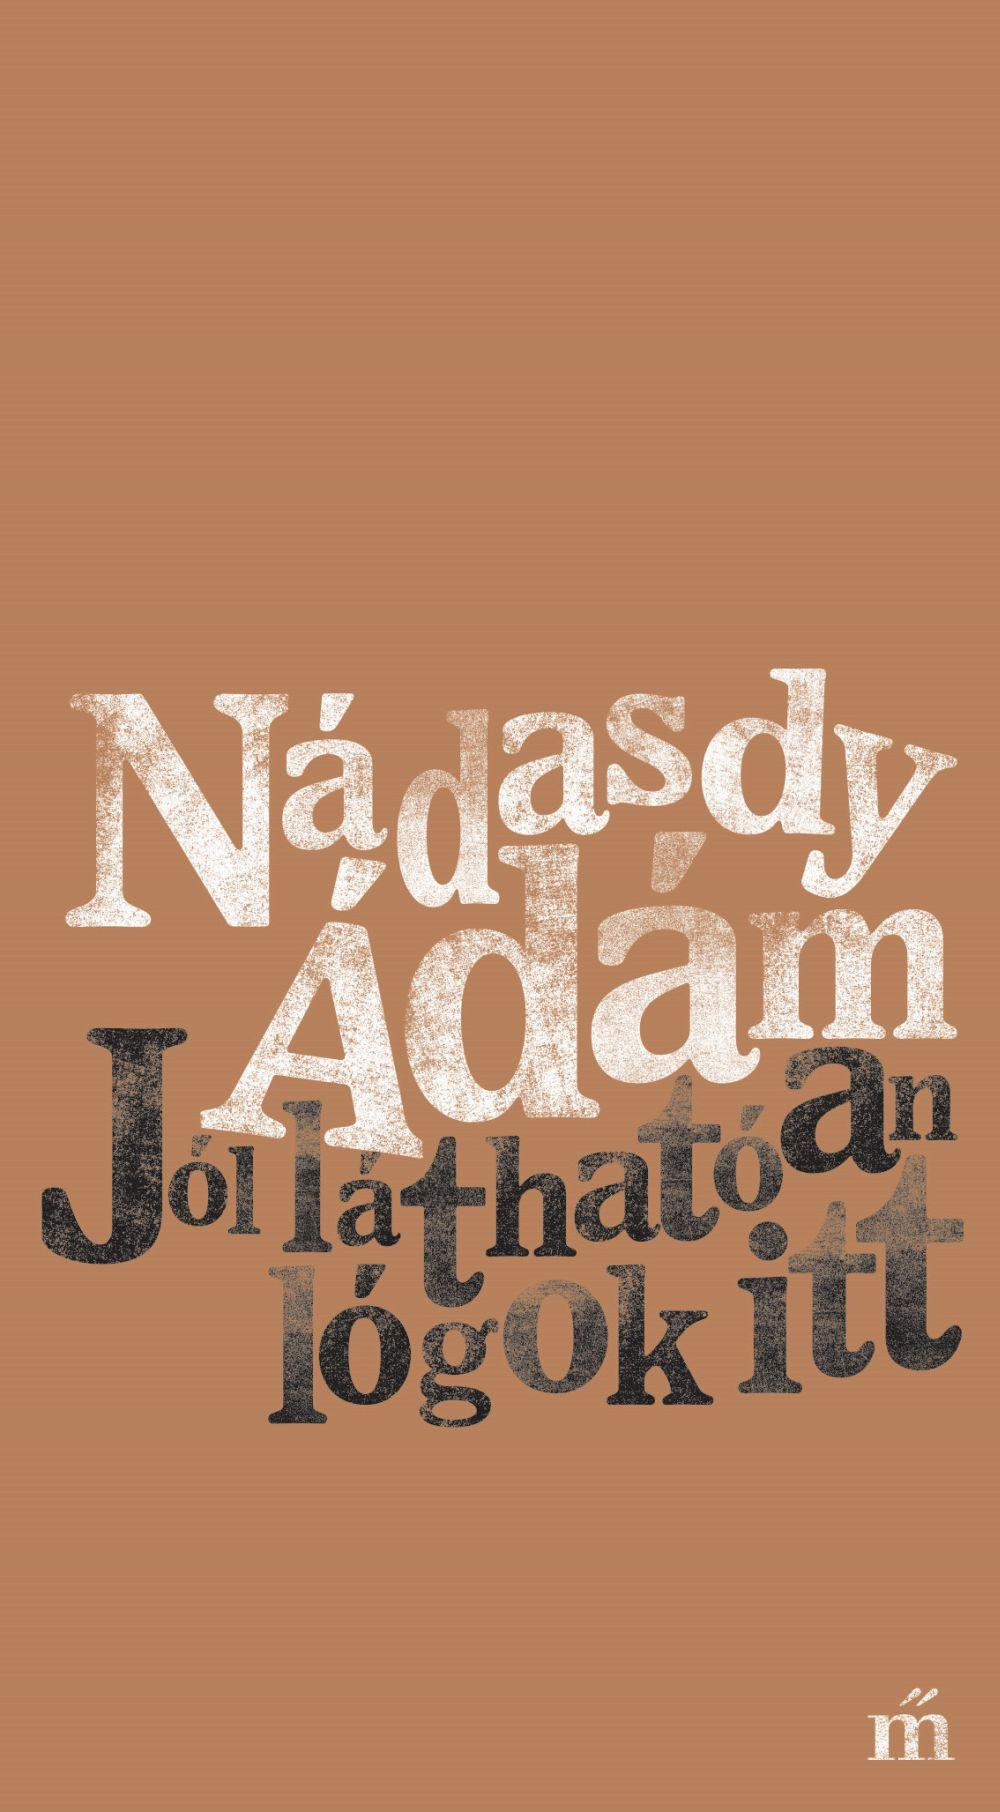 Nádasdy Ádám - Jól láthatóan lógok itt